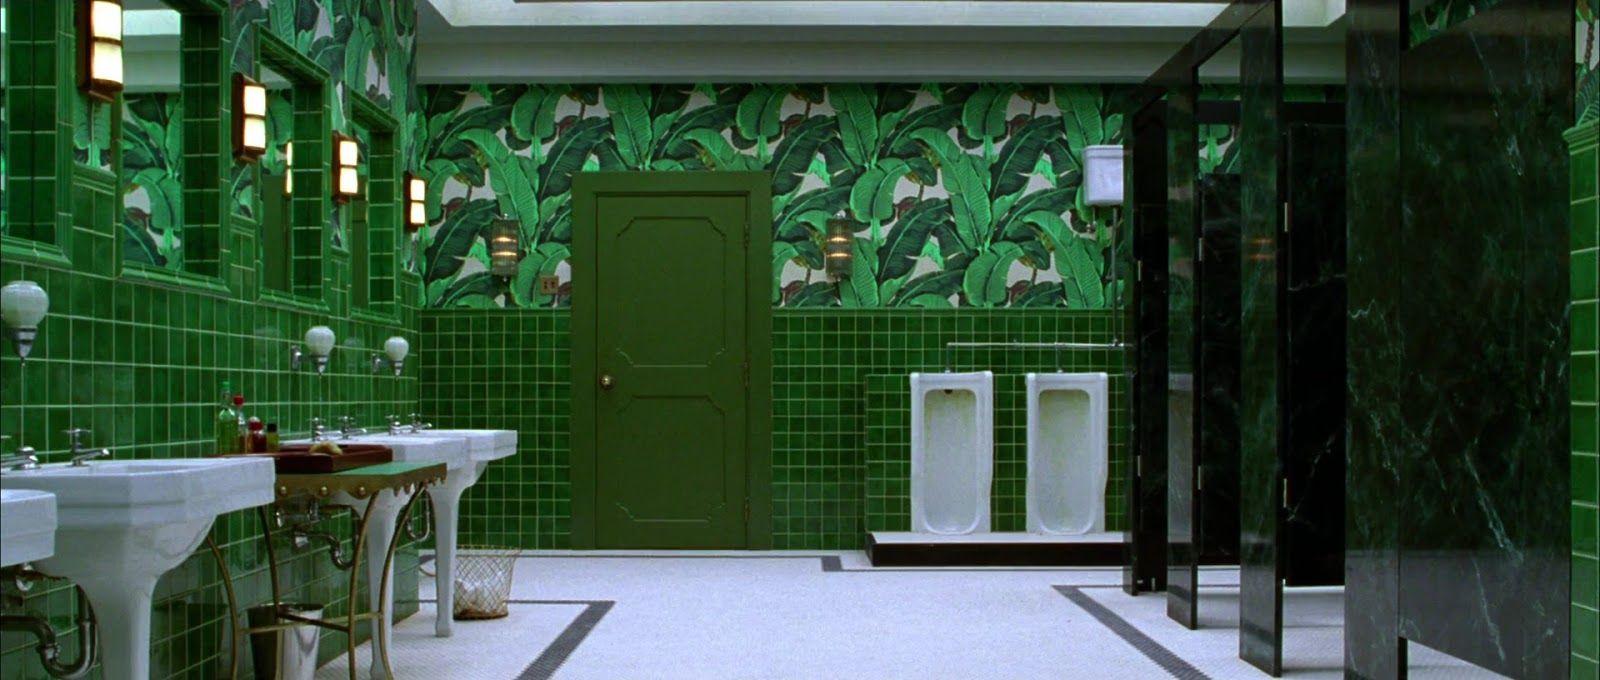 Inspiration from The Aviator bathroom scene